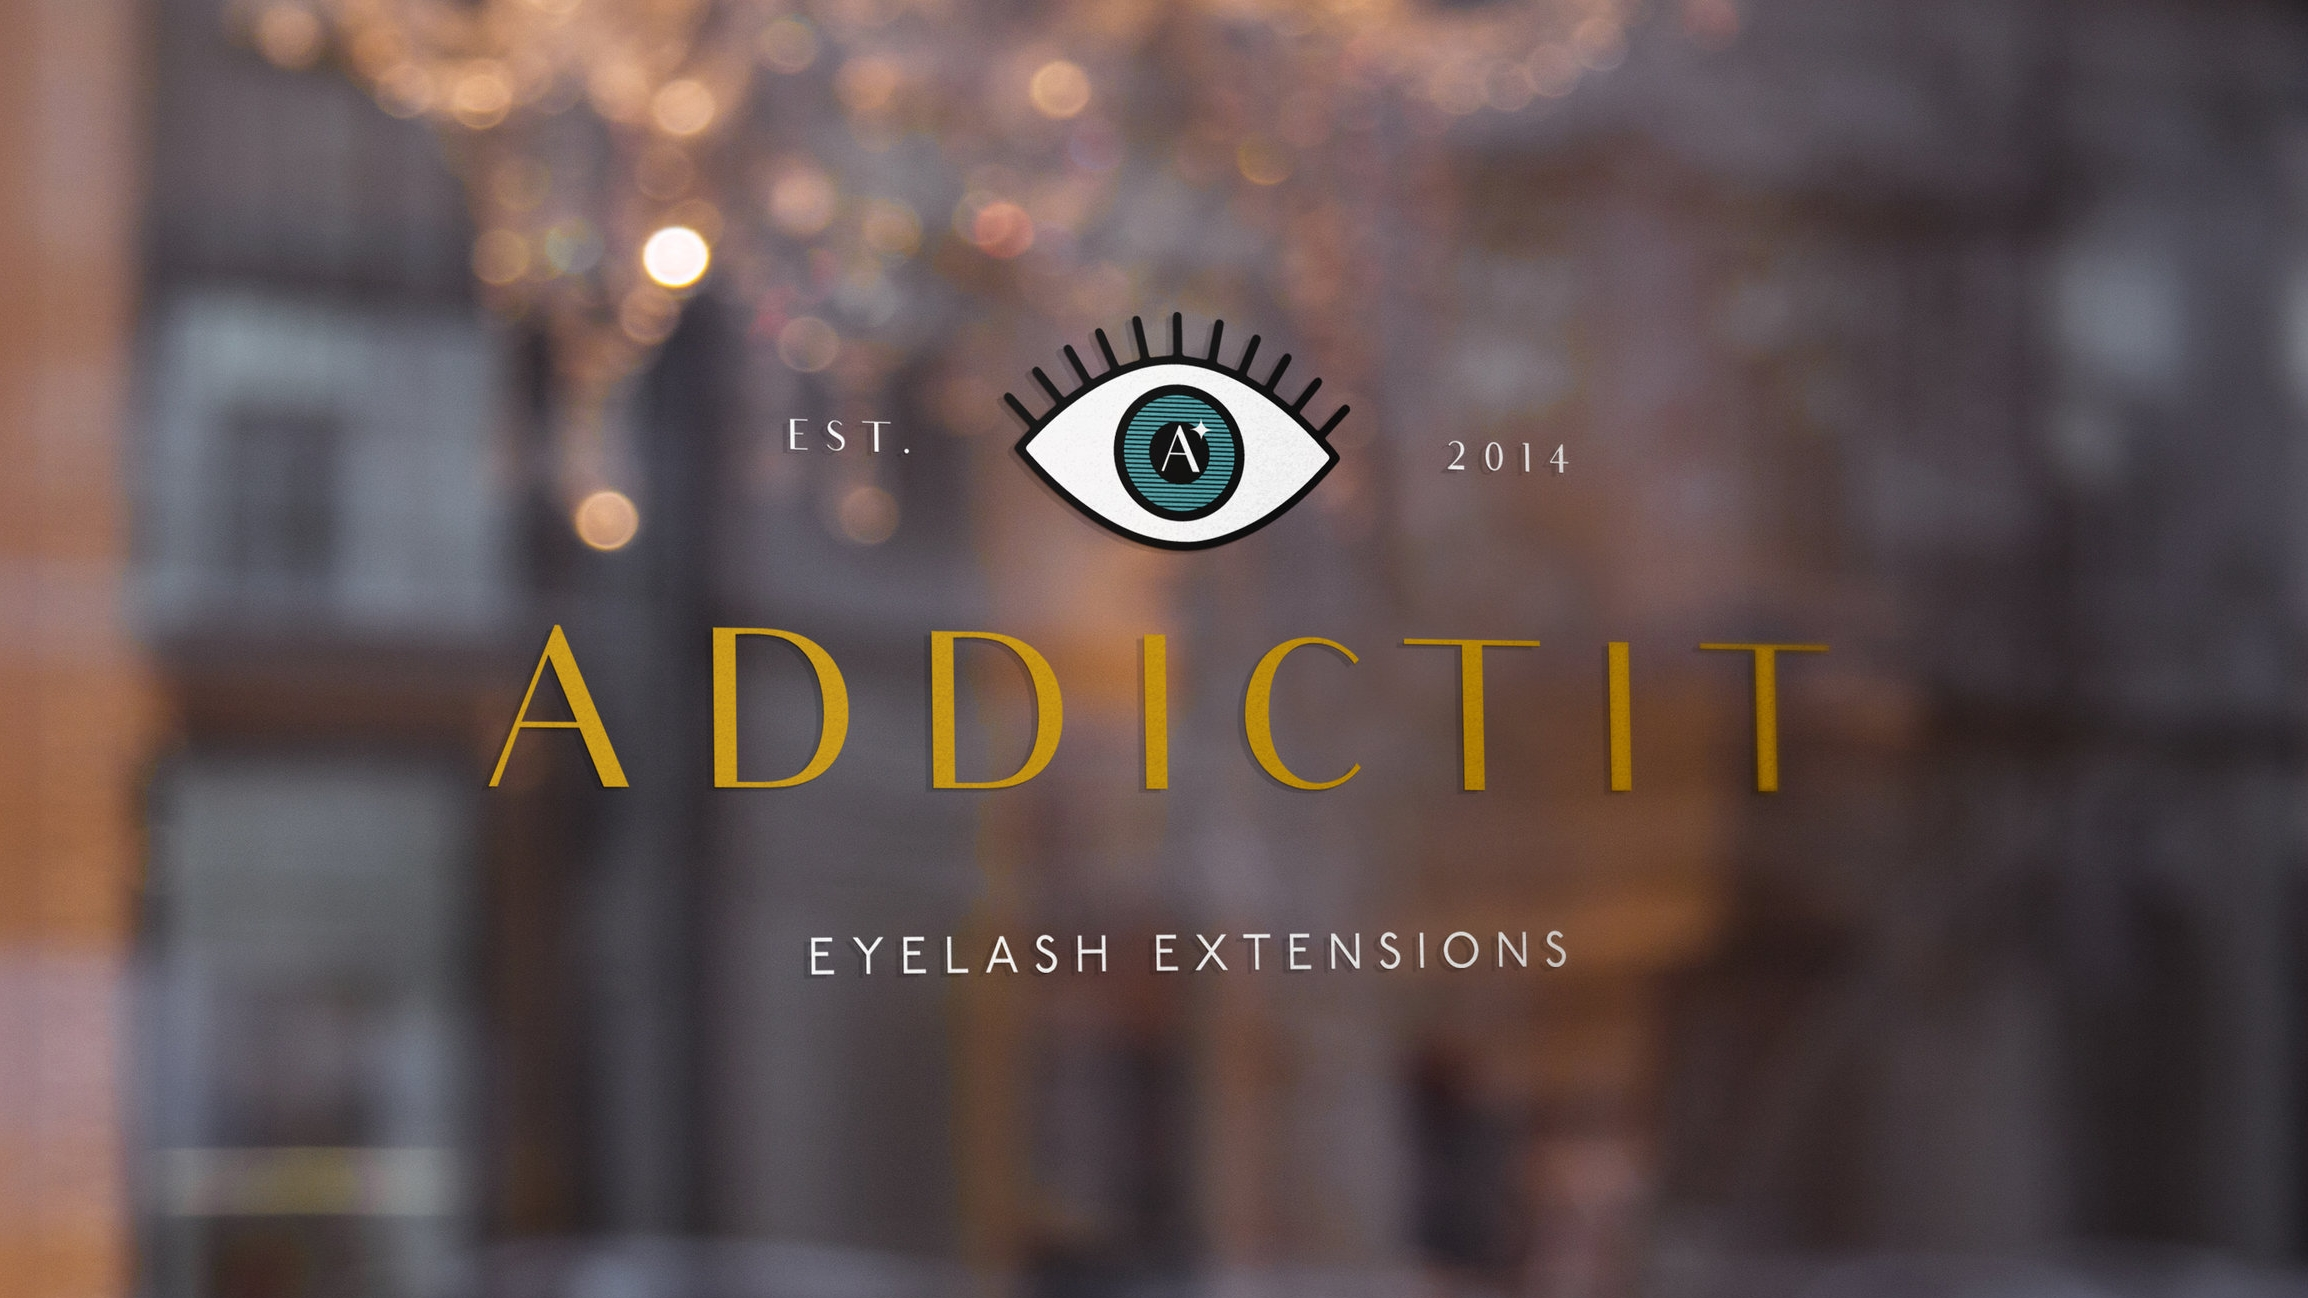 Addictit Eyelash Extensions